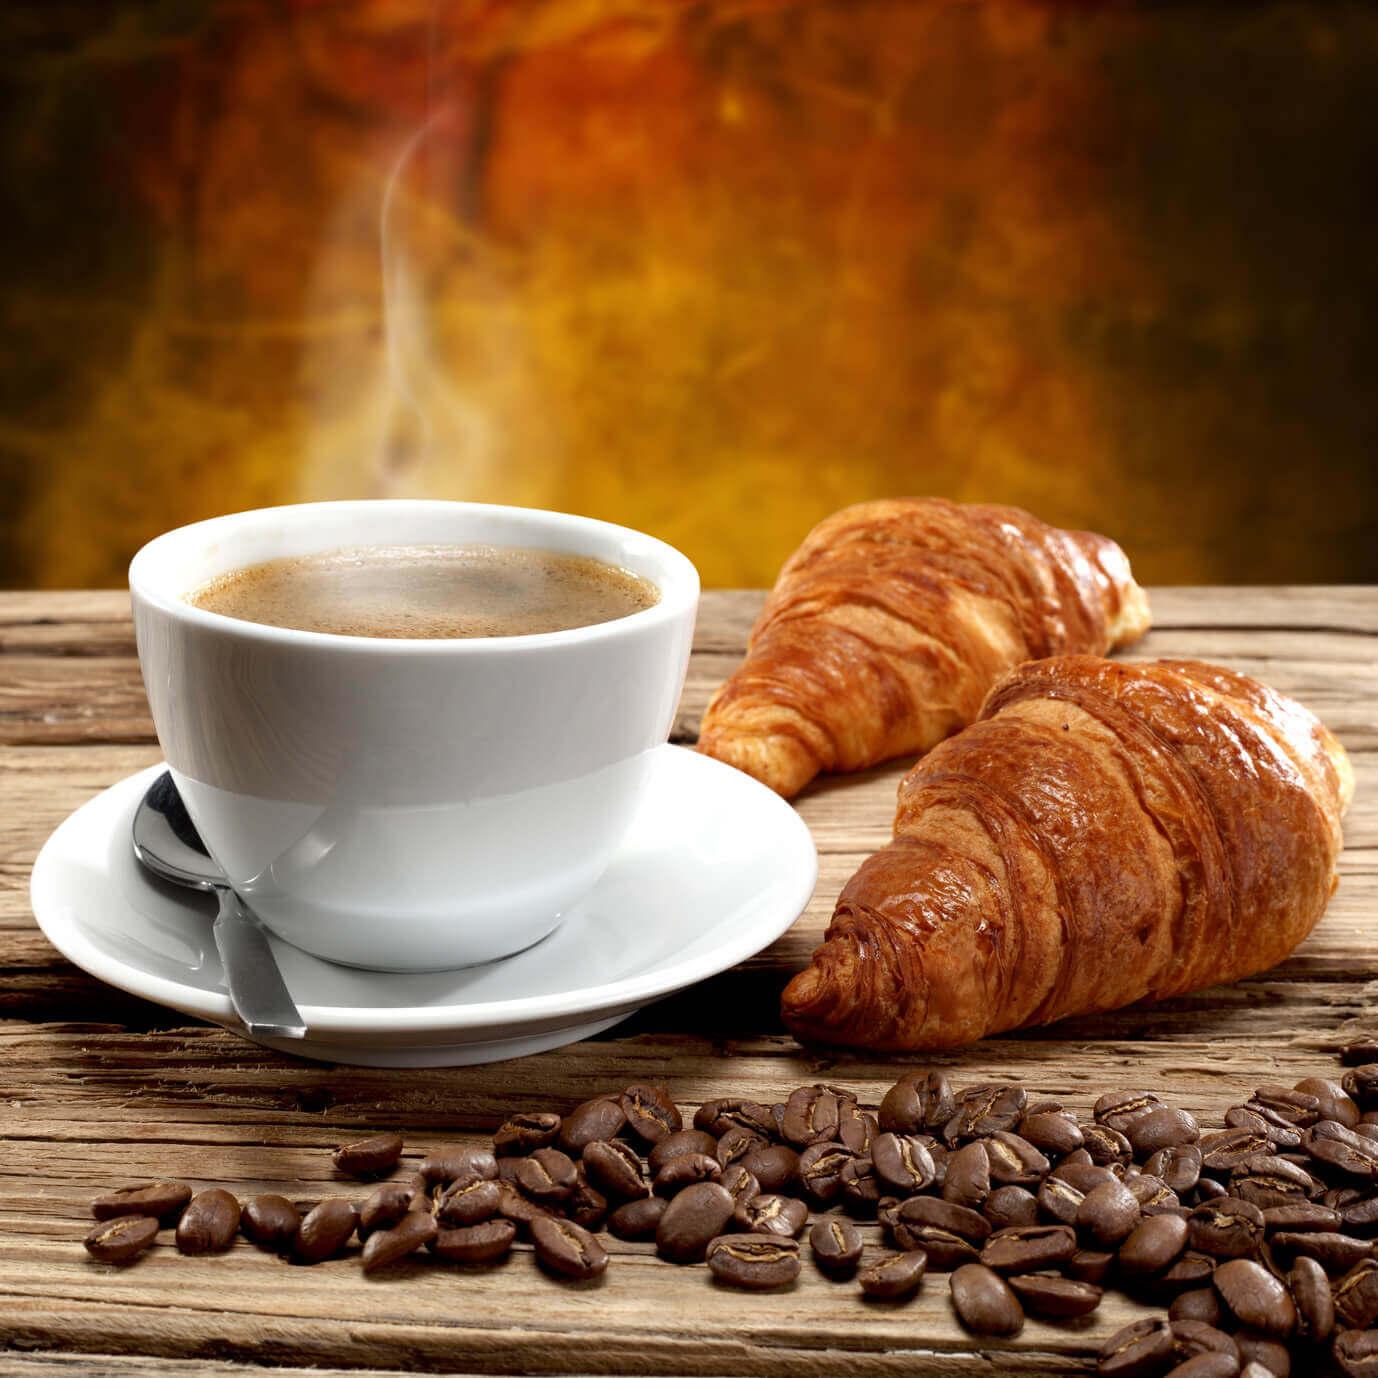 kaffee espresso kapseln online kaufen roast market. Black Bedroom Furniture Sets. Home Design Ideas